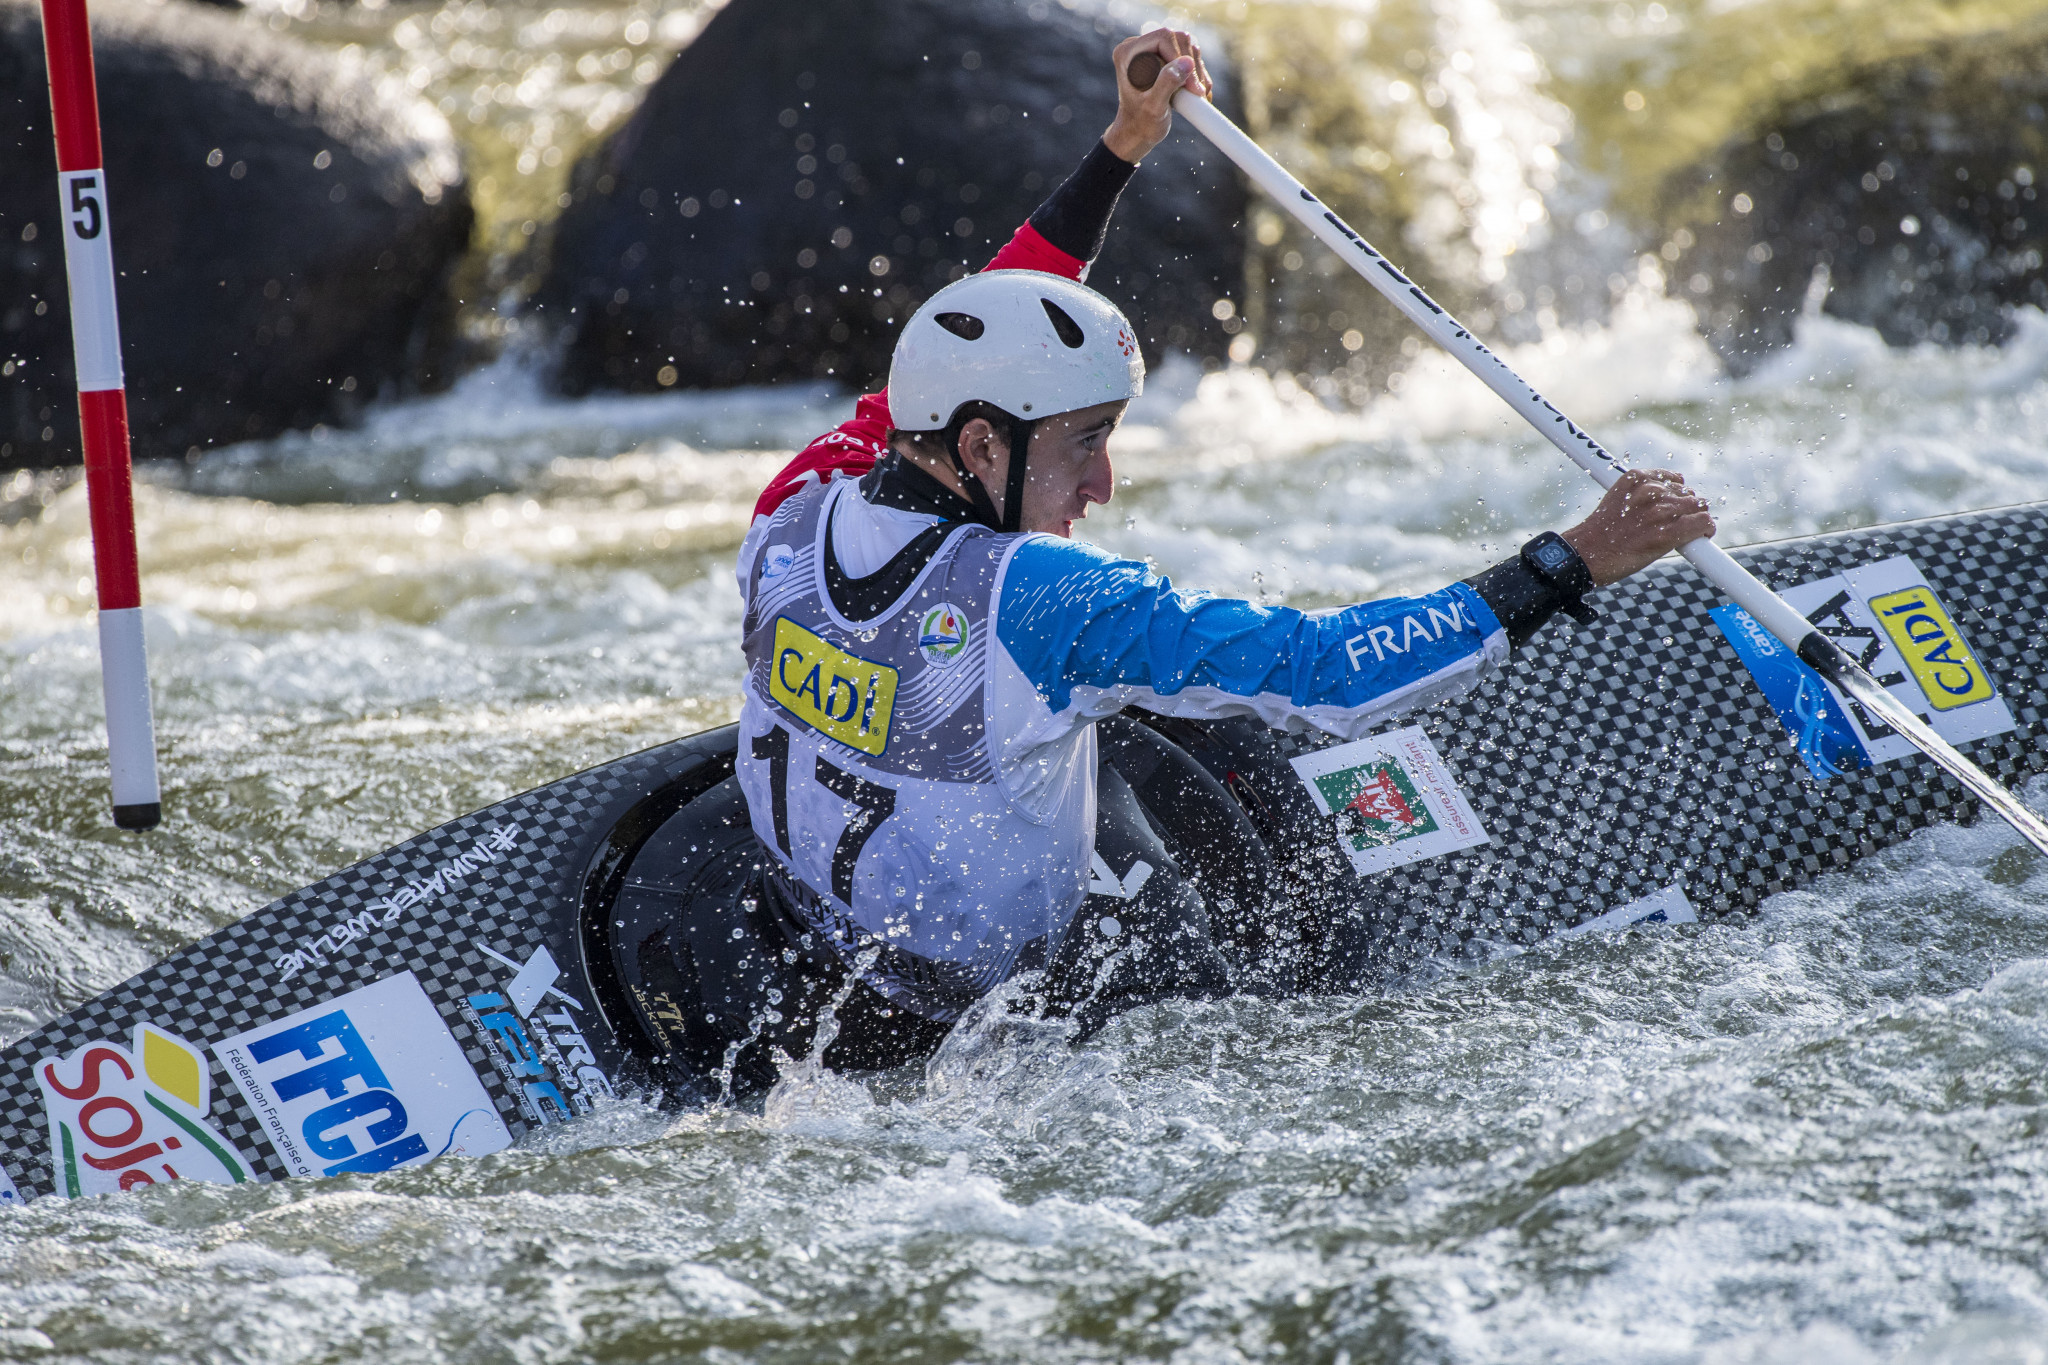 Rainstorms put damper on opening day of Tokyo 2020 canoe slalom test event